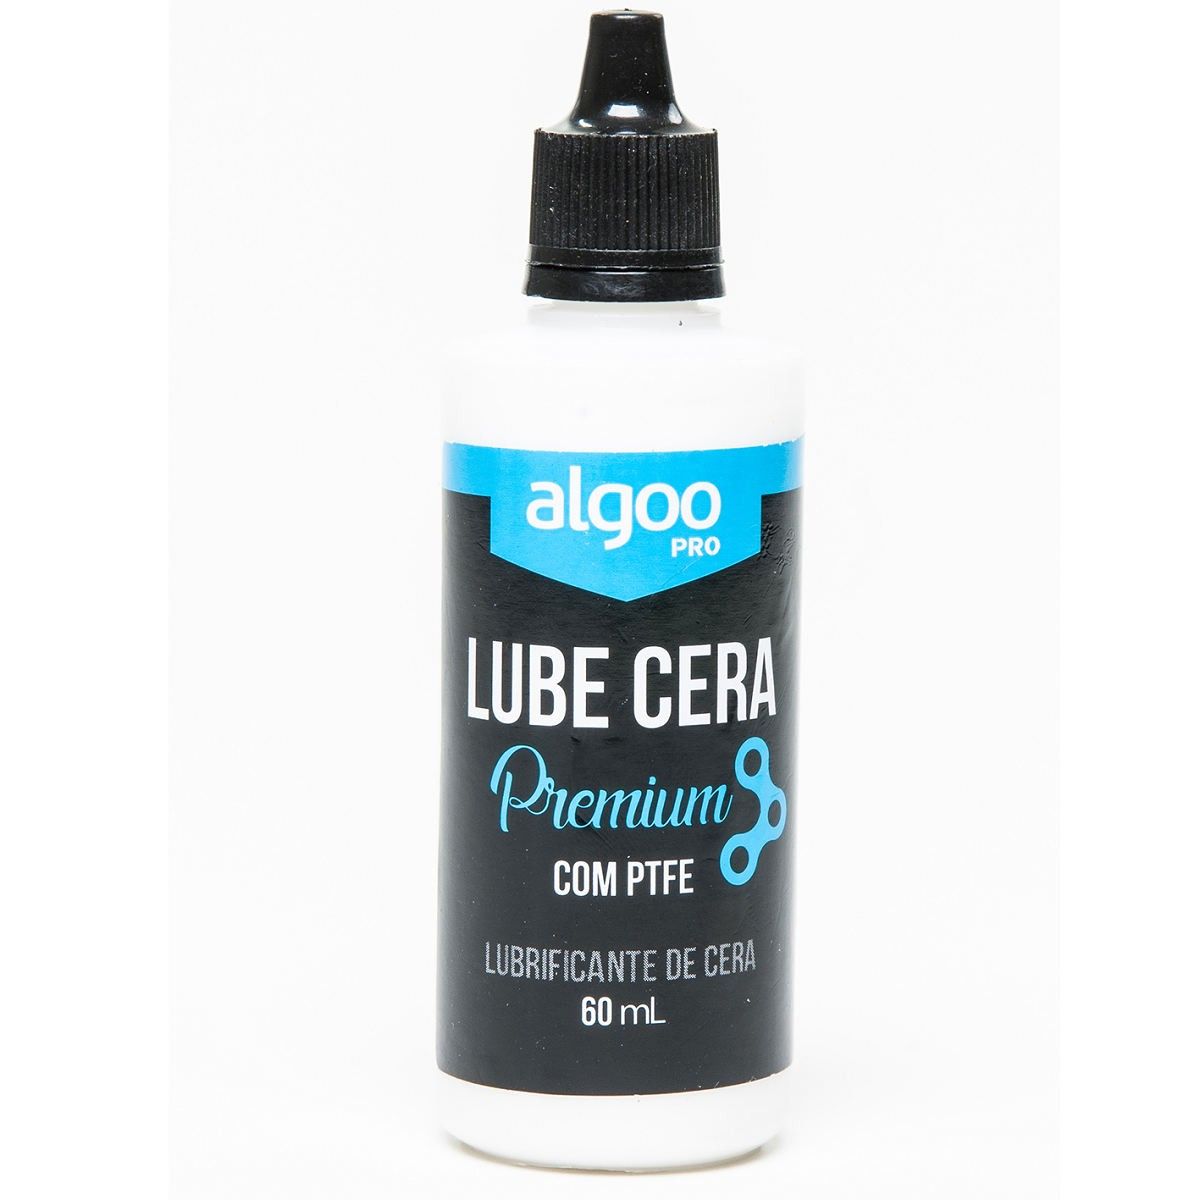 Lubrificante Algoo Cera Premium 60ml  - IBIKES